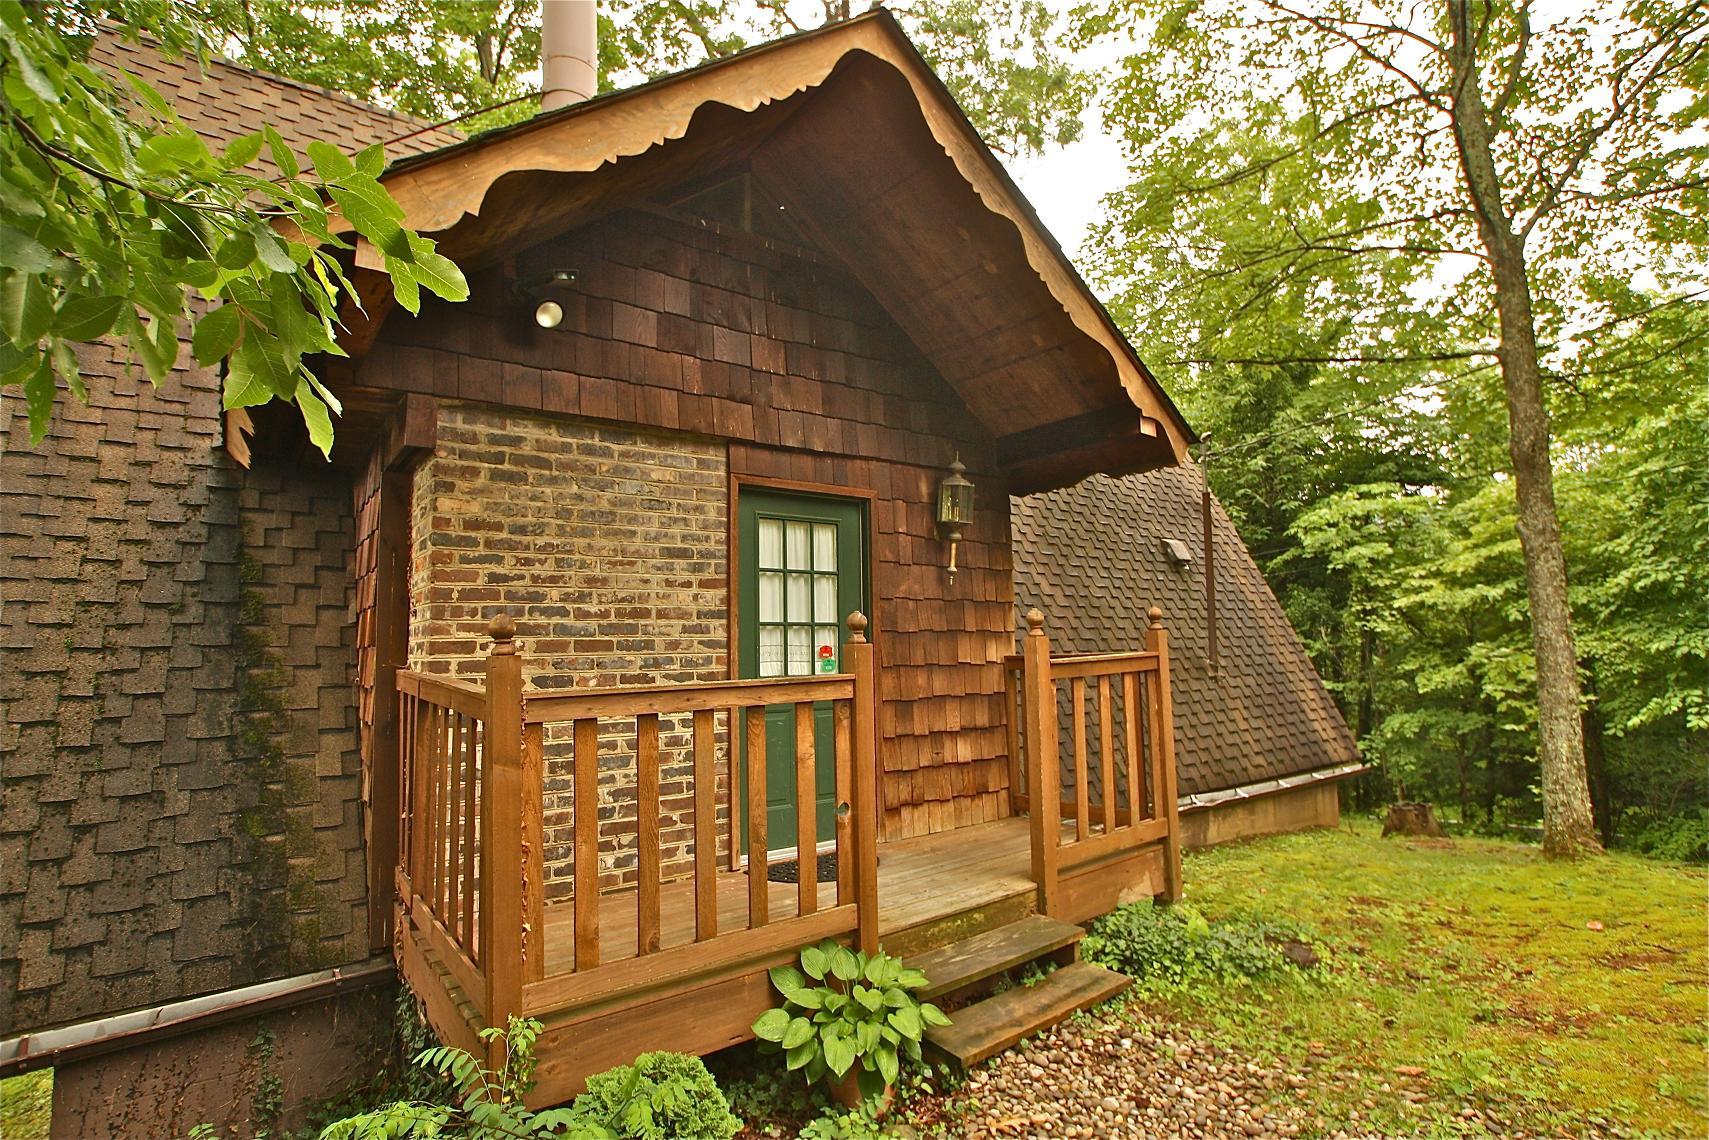 A 1 Bedroom Cabin In Gatlinburg,Tennessee